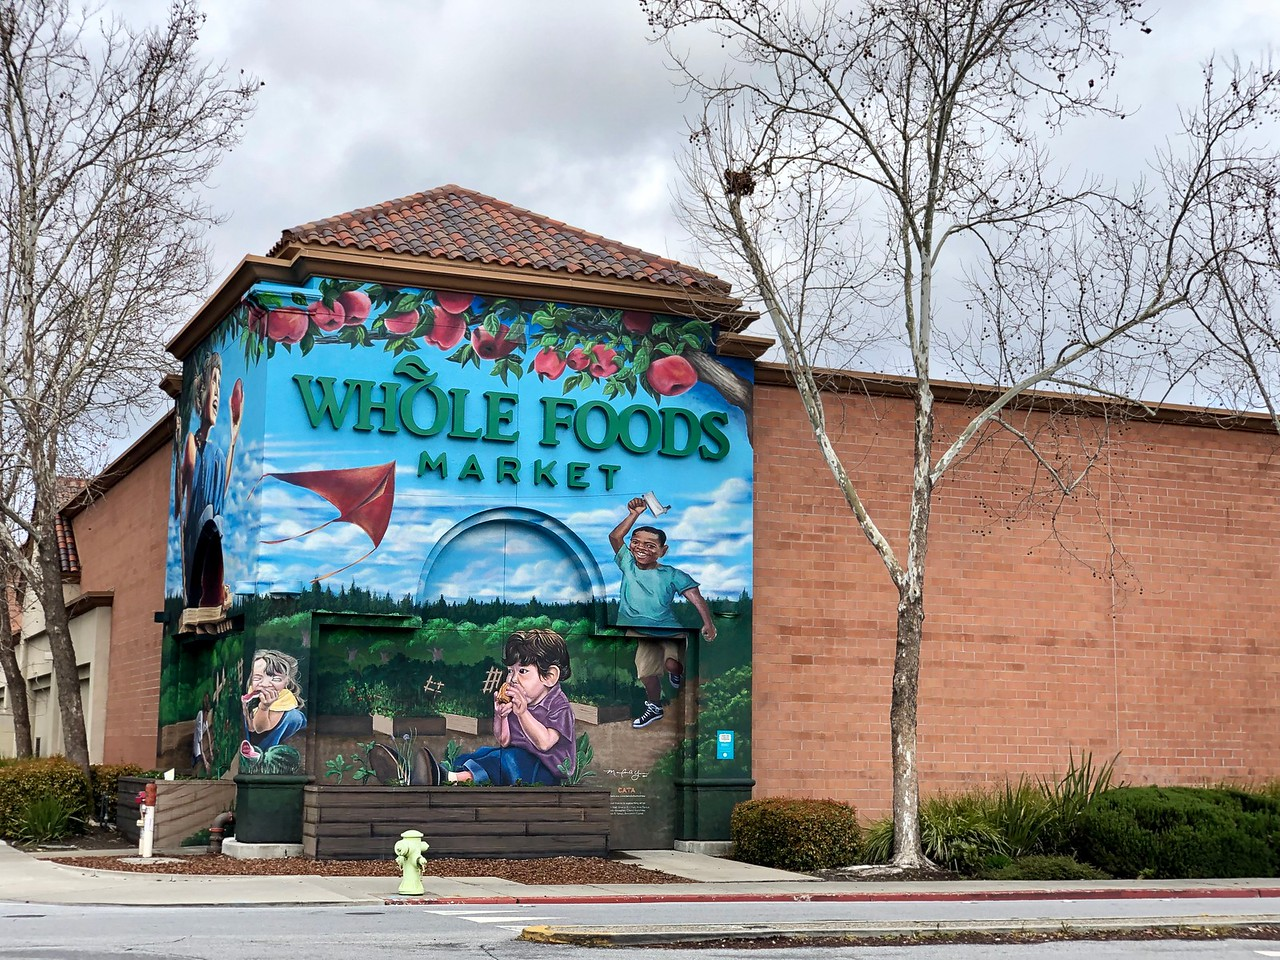 Whole+Foods+Market+Grocery+Store+Redwood+City+Blu+Skye+Media-X2.jpg